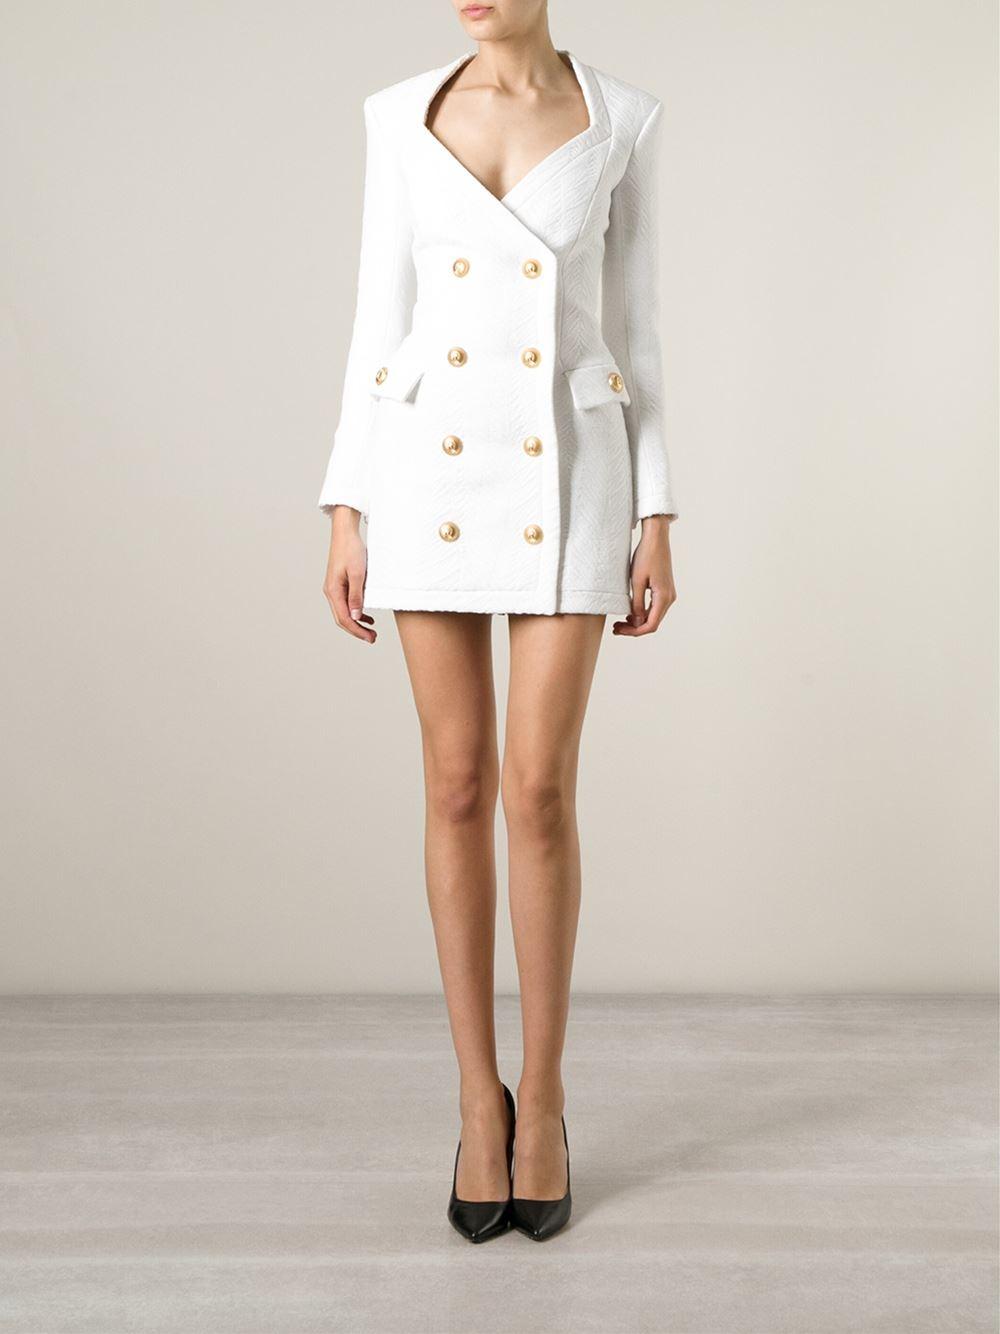 Balmain Textured Blazer Dress In White